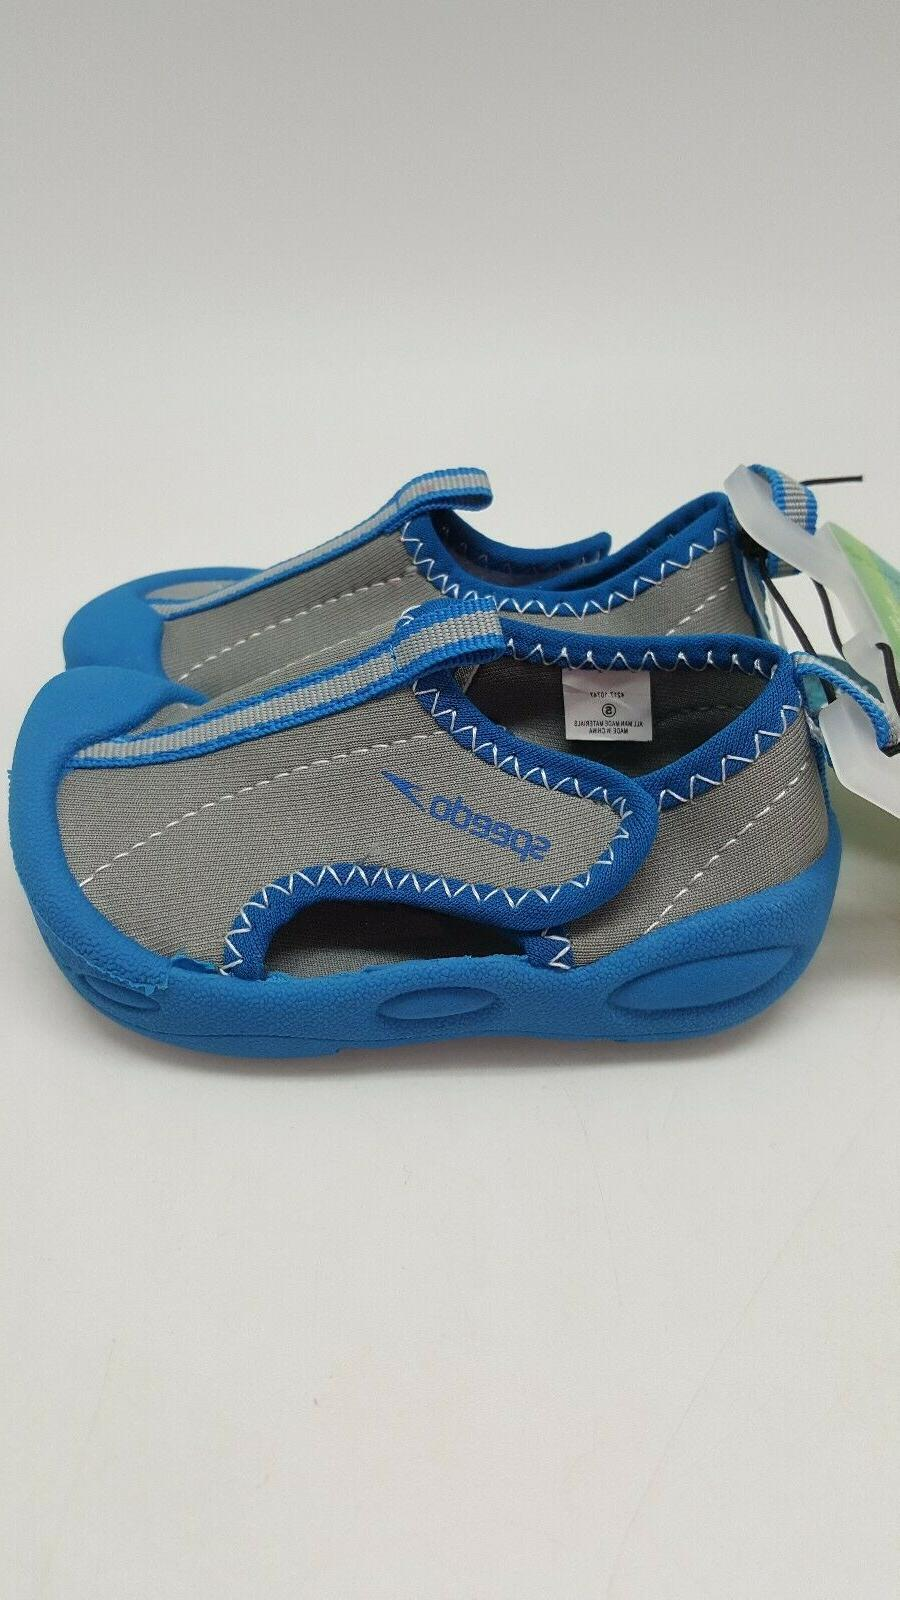 Speedo Toddler Hybrid Water Shoes Blue Shoe Size Beach